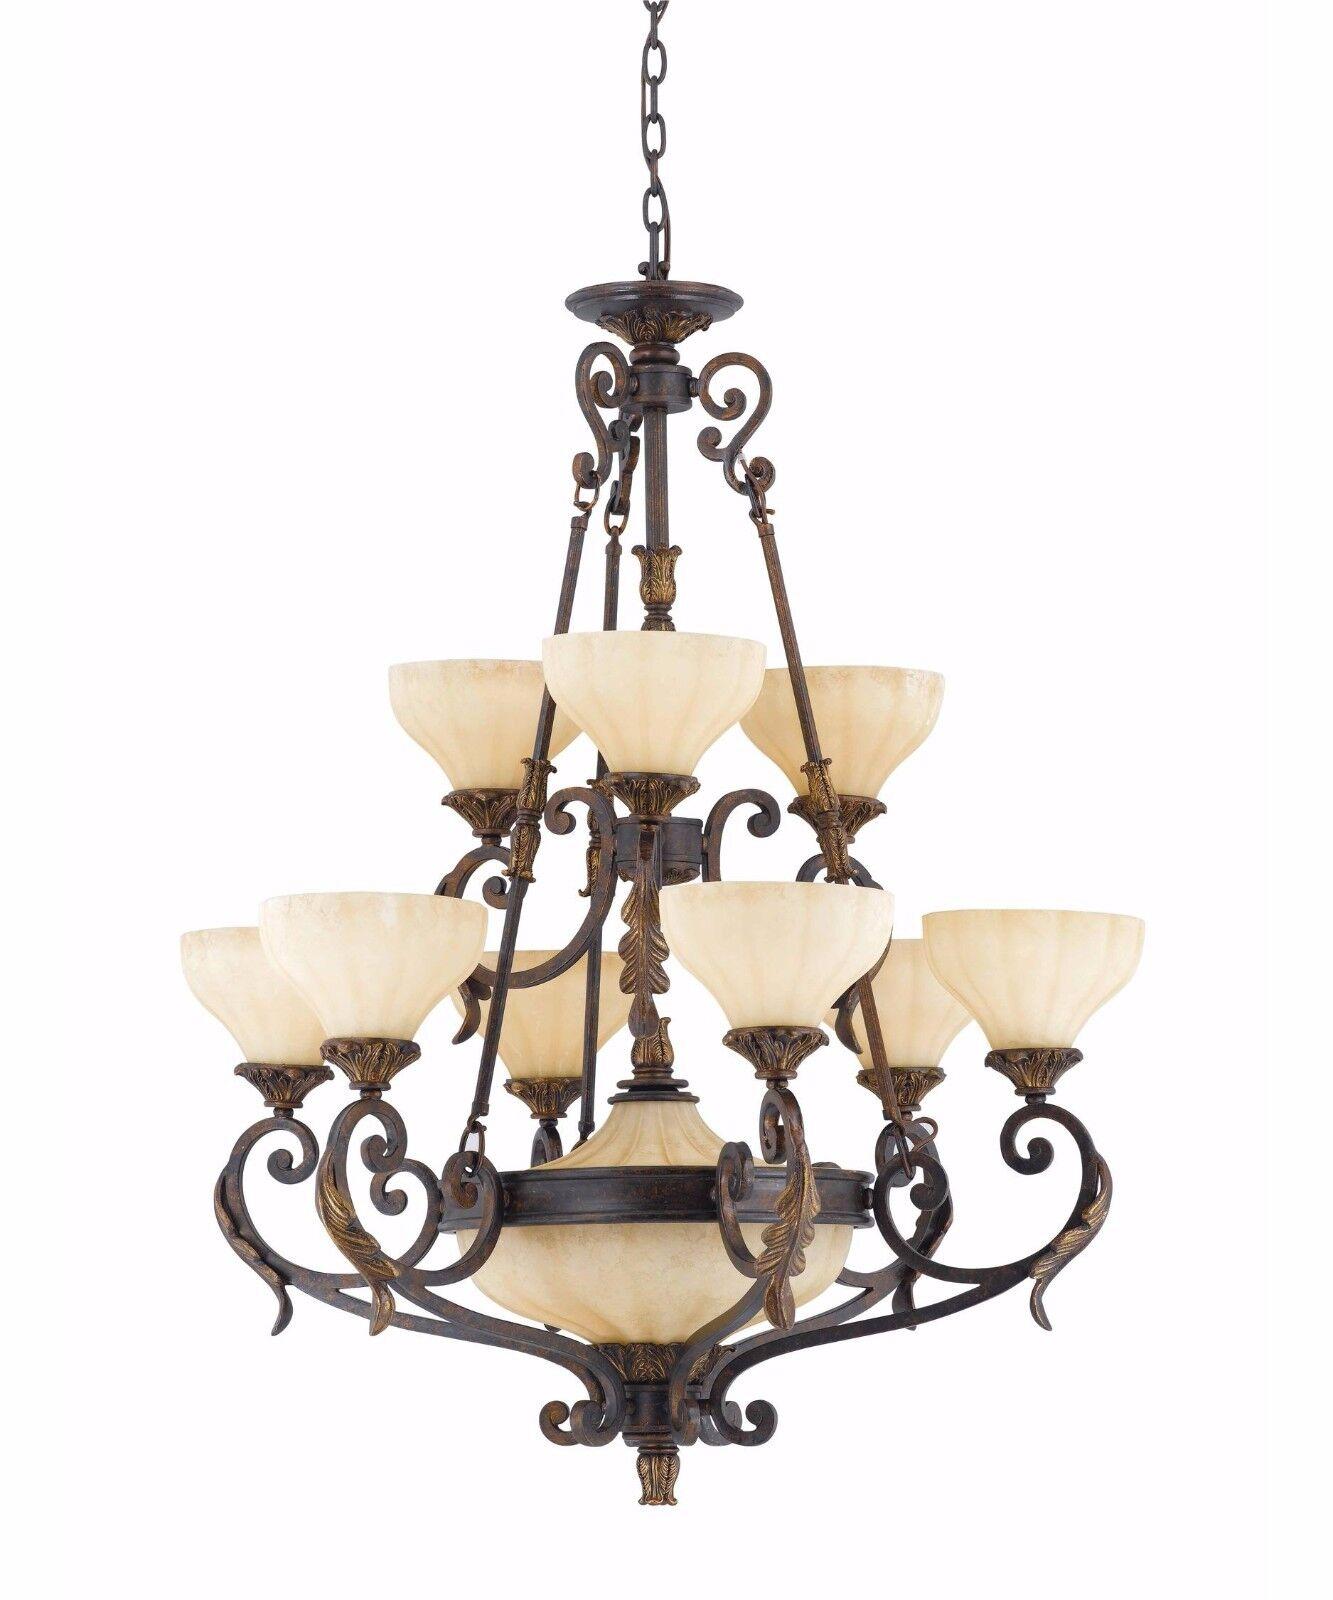 Triarch international venus 11 light chandelier english bronze ebay picture 1 of 1 arubaitofo Image collections